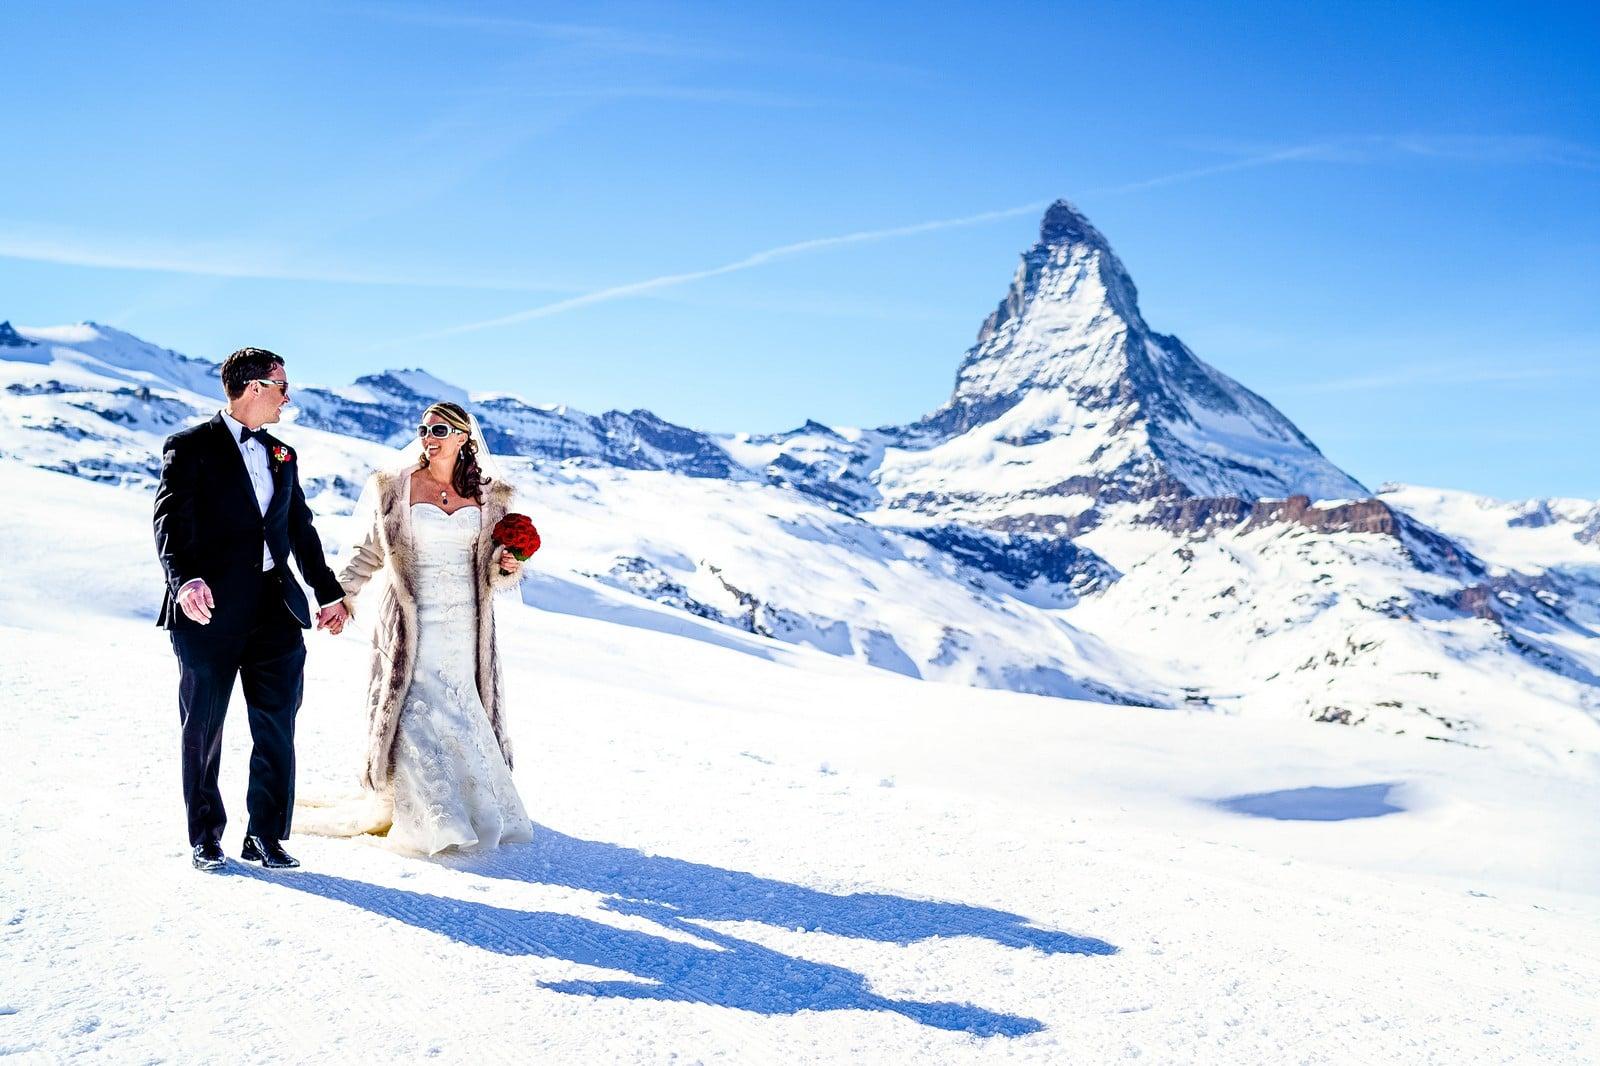 best of 2019 - Swiss alpes wedding photographer 045